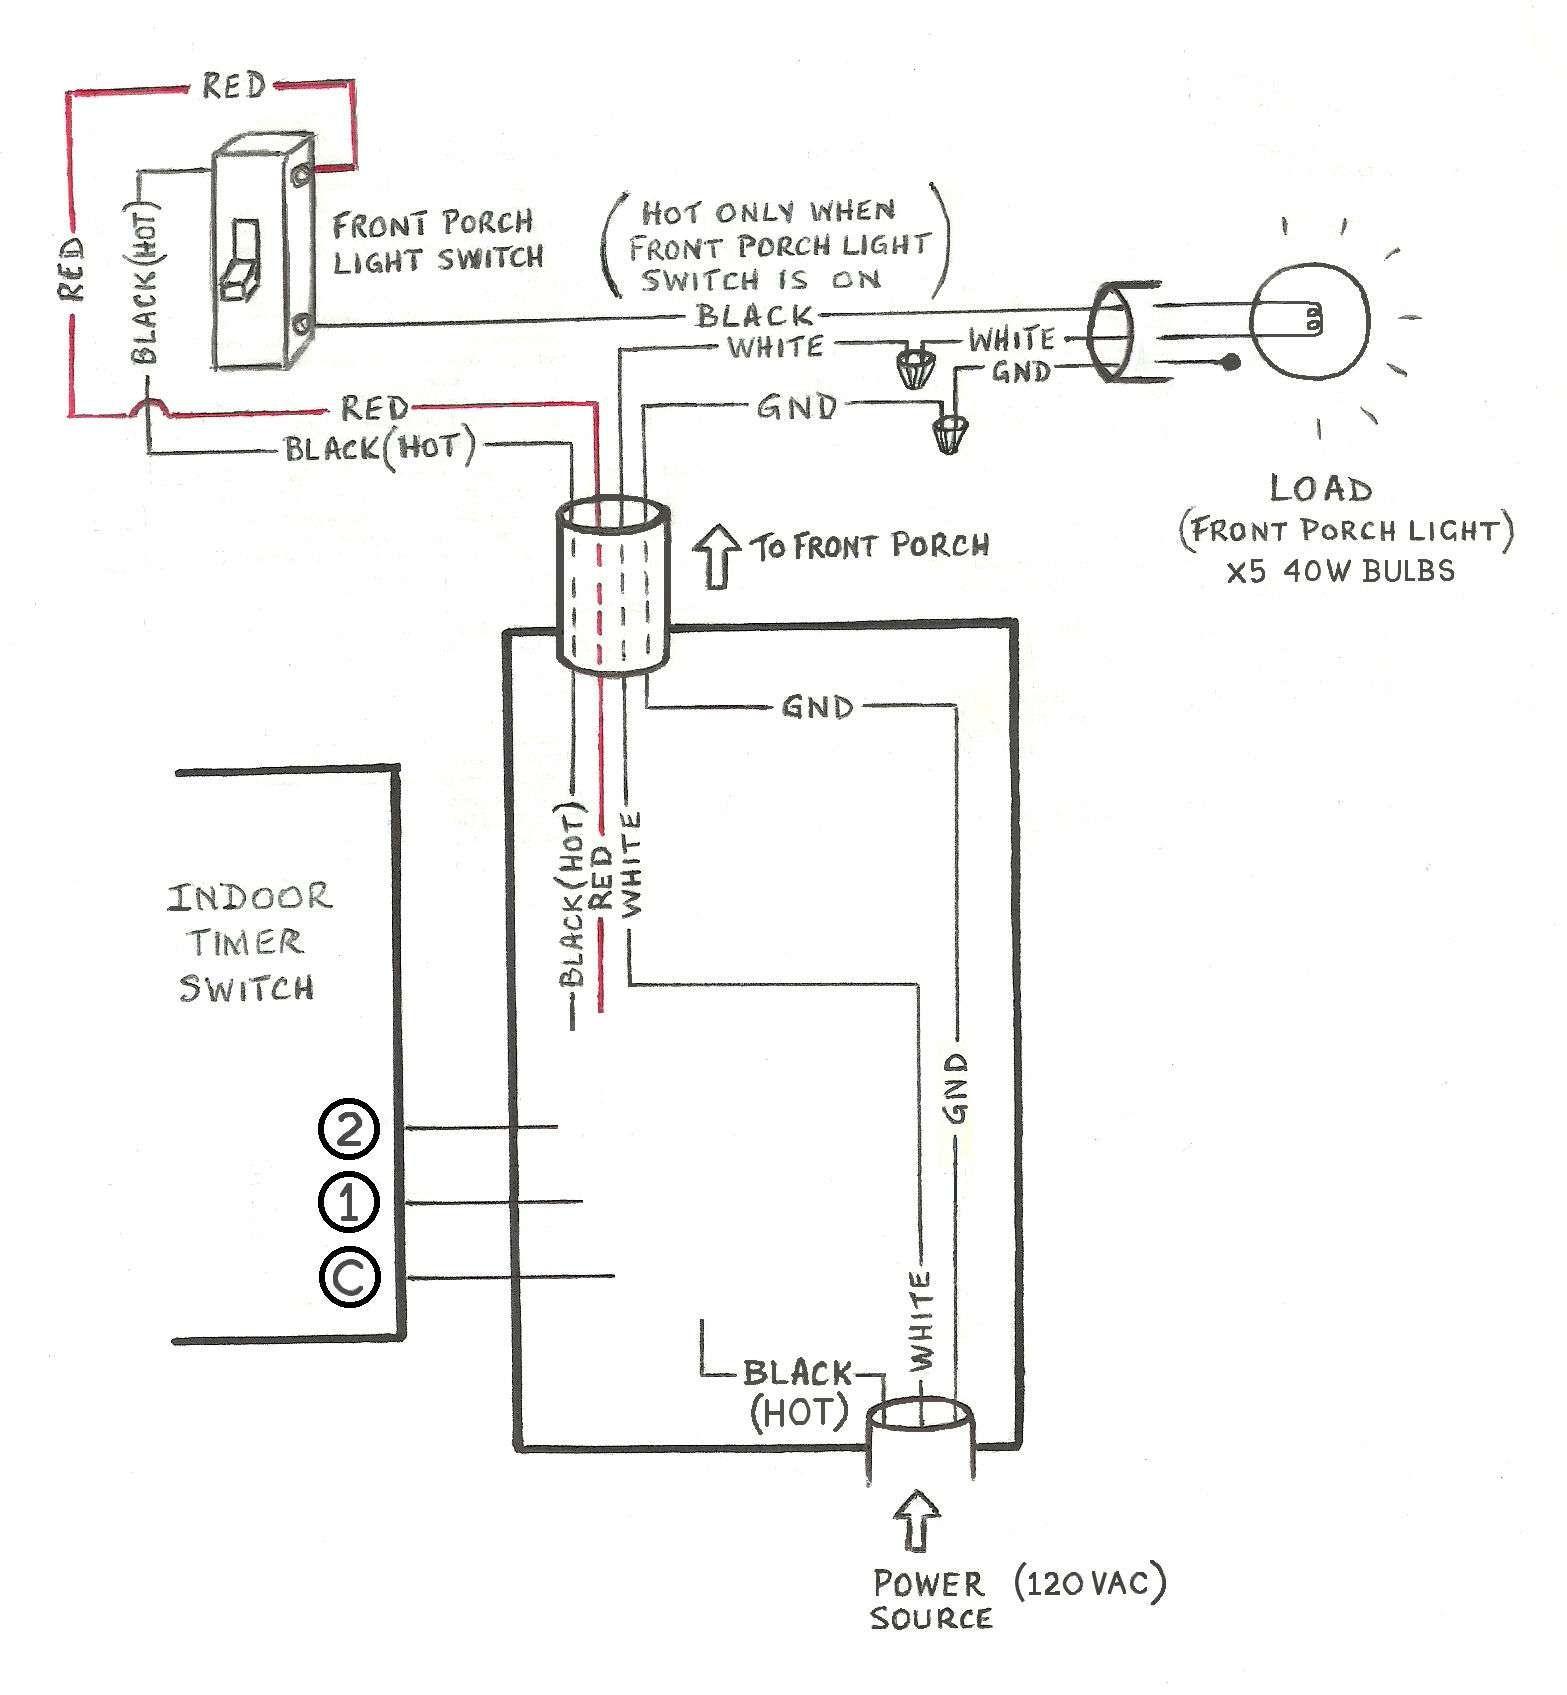 wiring diagram bathroom lovely wiring diagram bathroom bathroom fan light wiring diagram mikulskilawoffices [ 1567 x 1695 Pixel ]